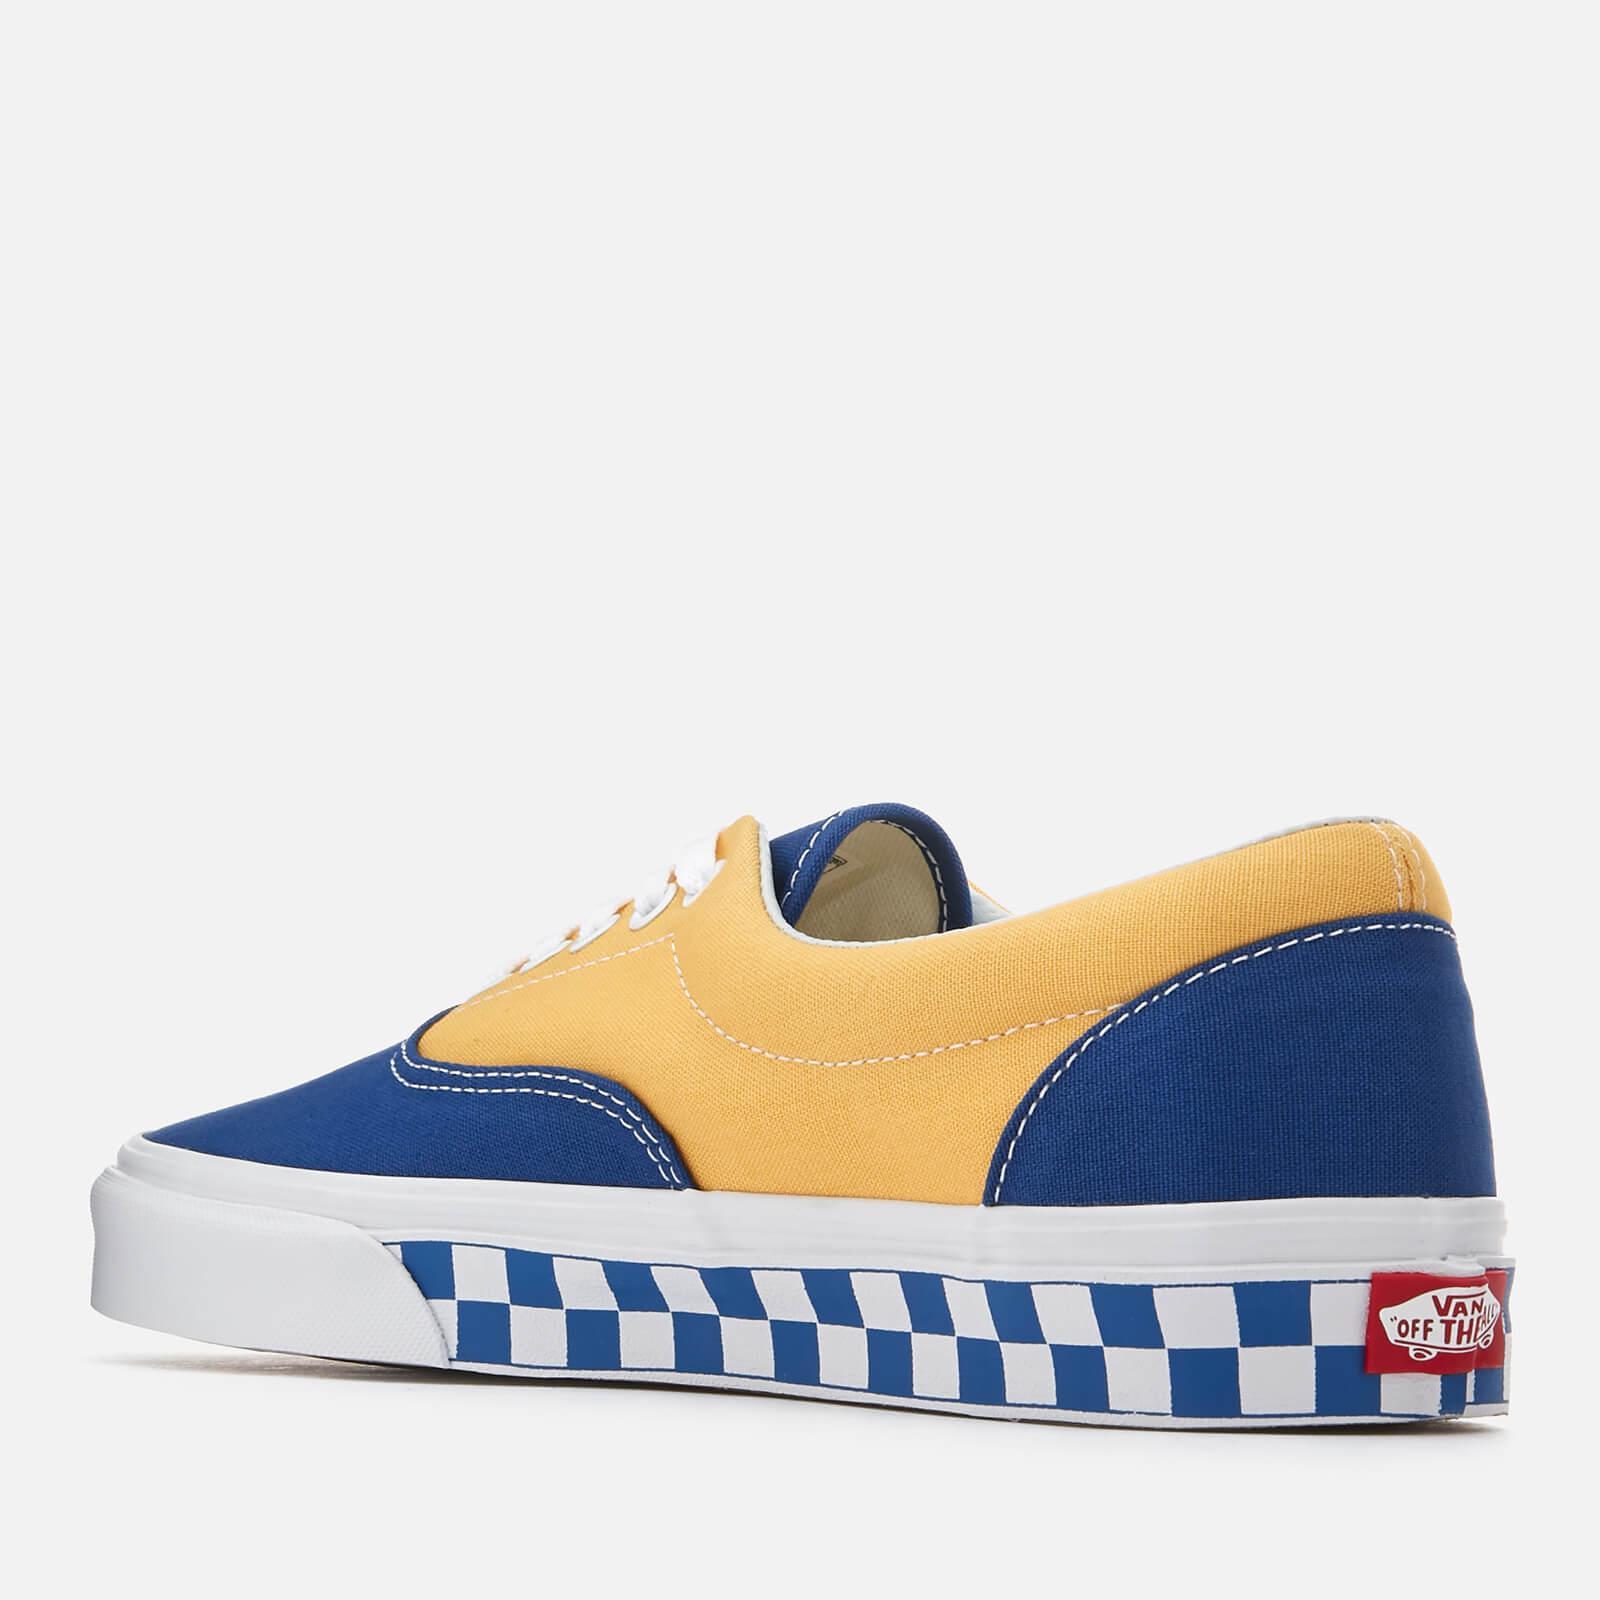 4224987440 Lyst - Vans Era Bmx Checkerboard Trainers in Blue for Men